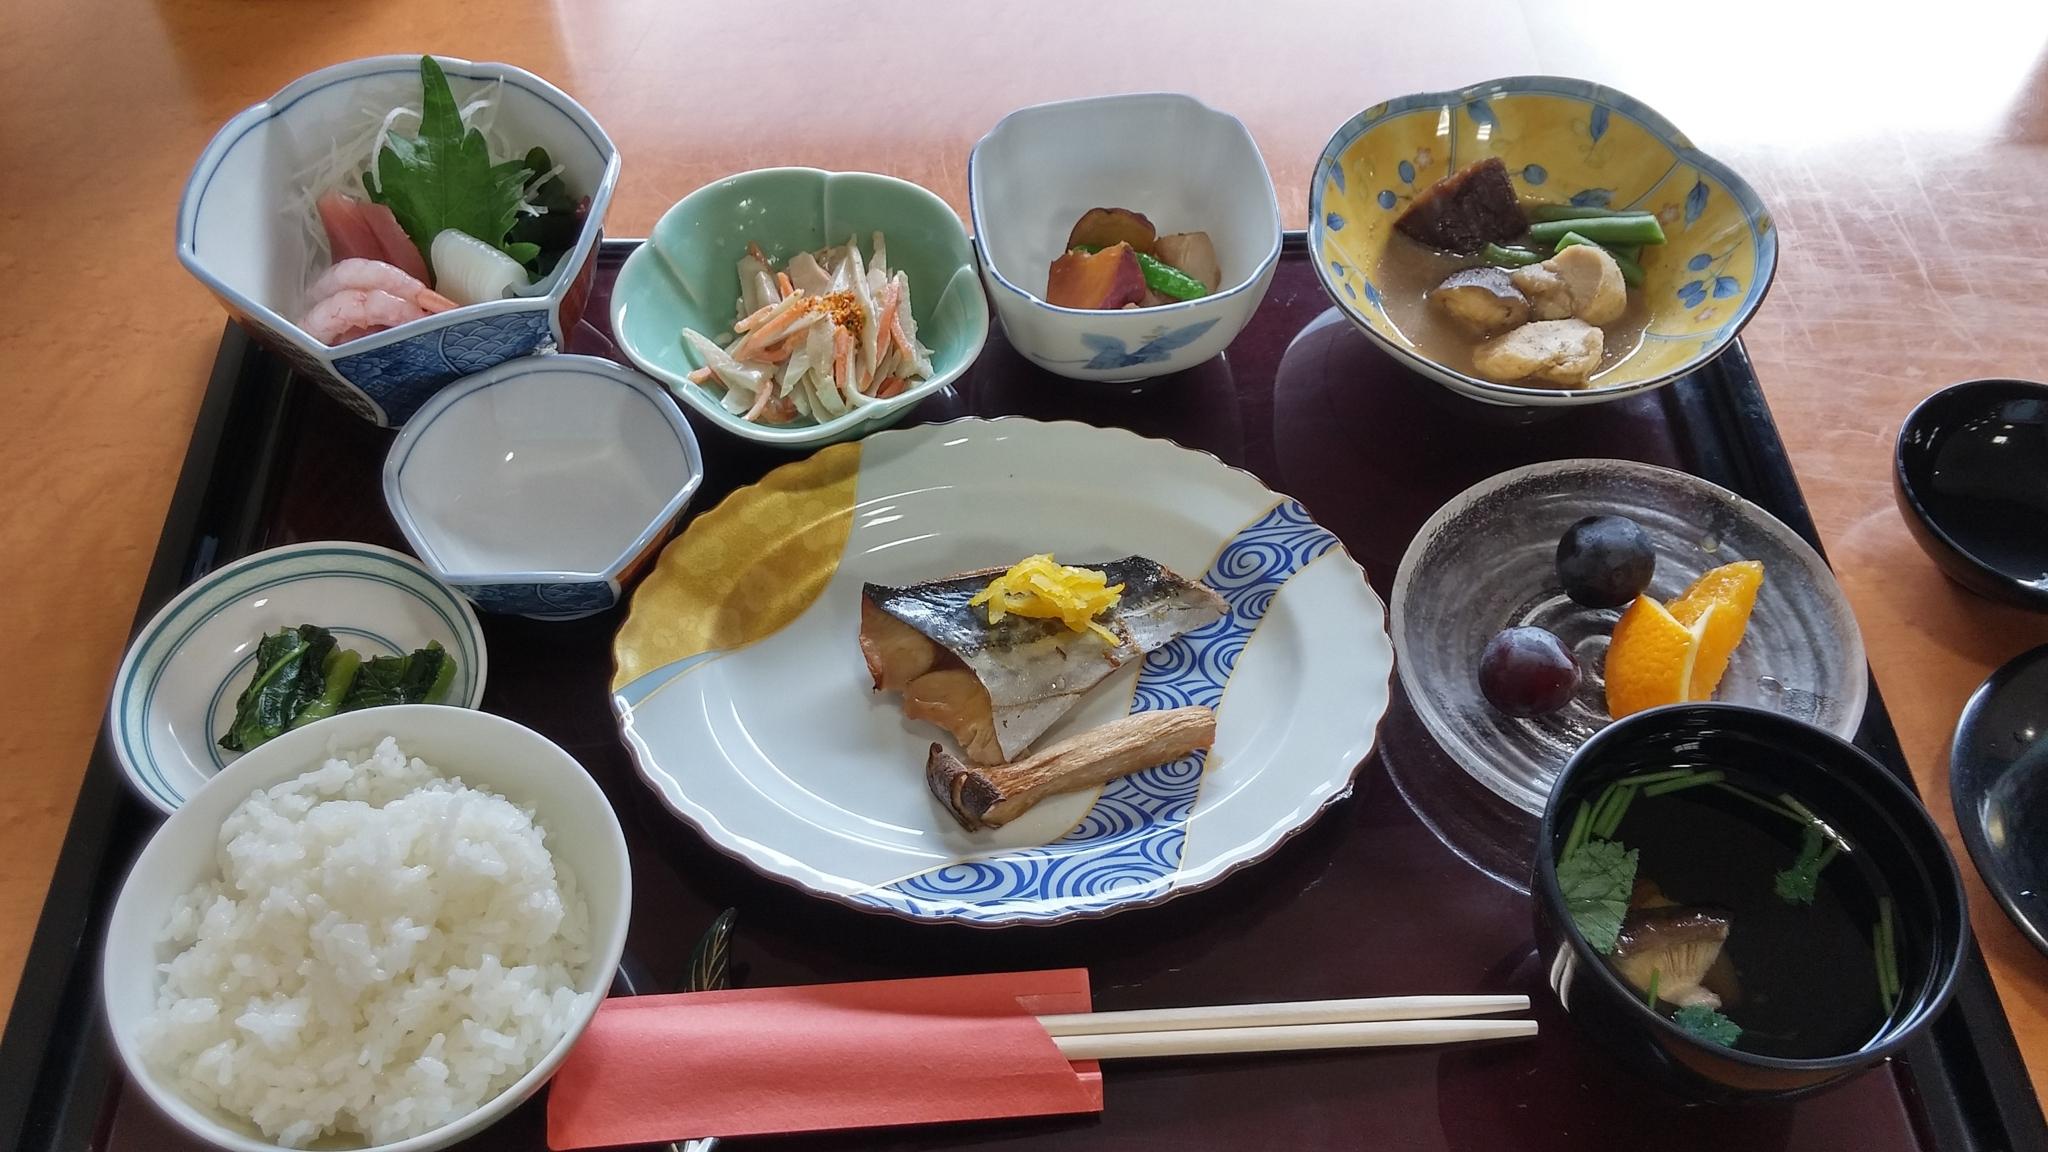 f:id:ToshUeno:20151107100142j:plain